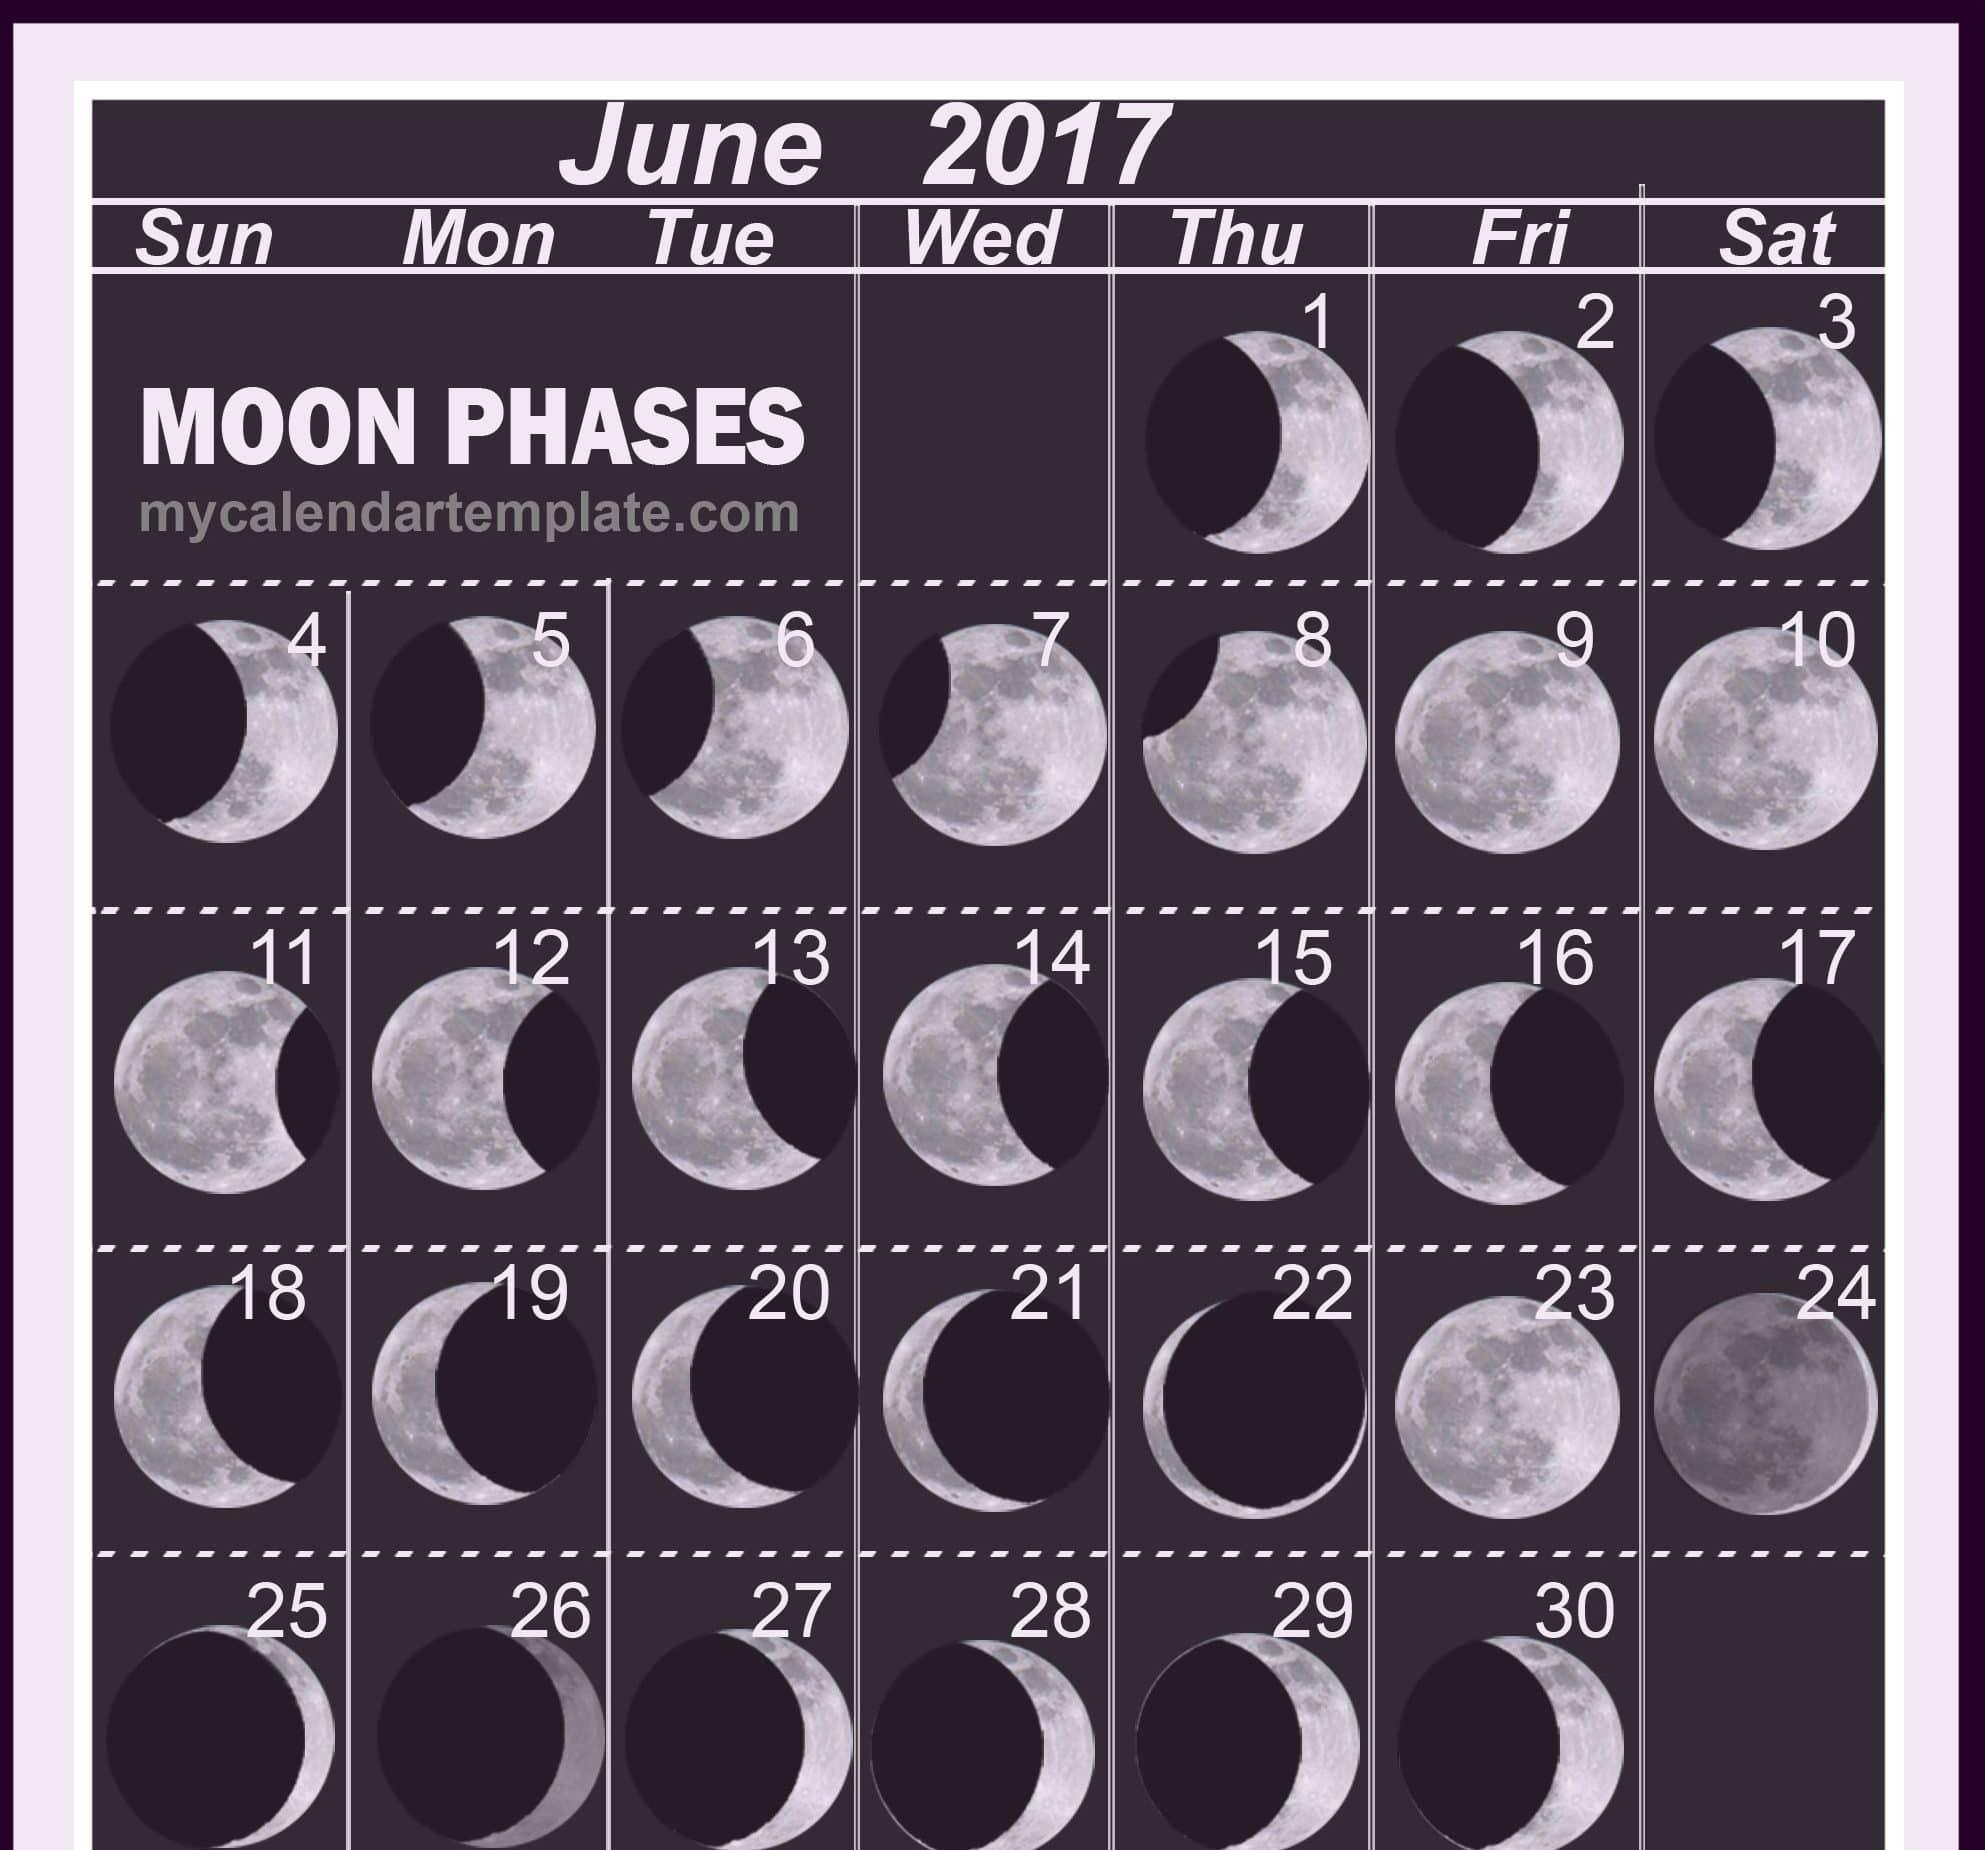 Monthly June 2017 Lunar Calendar Image